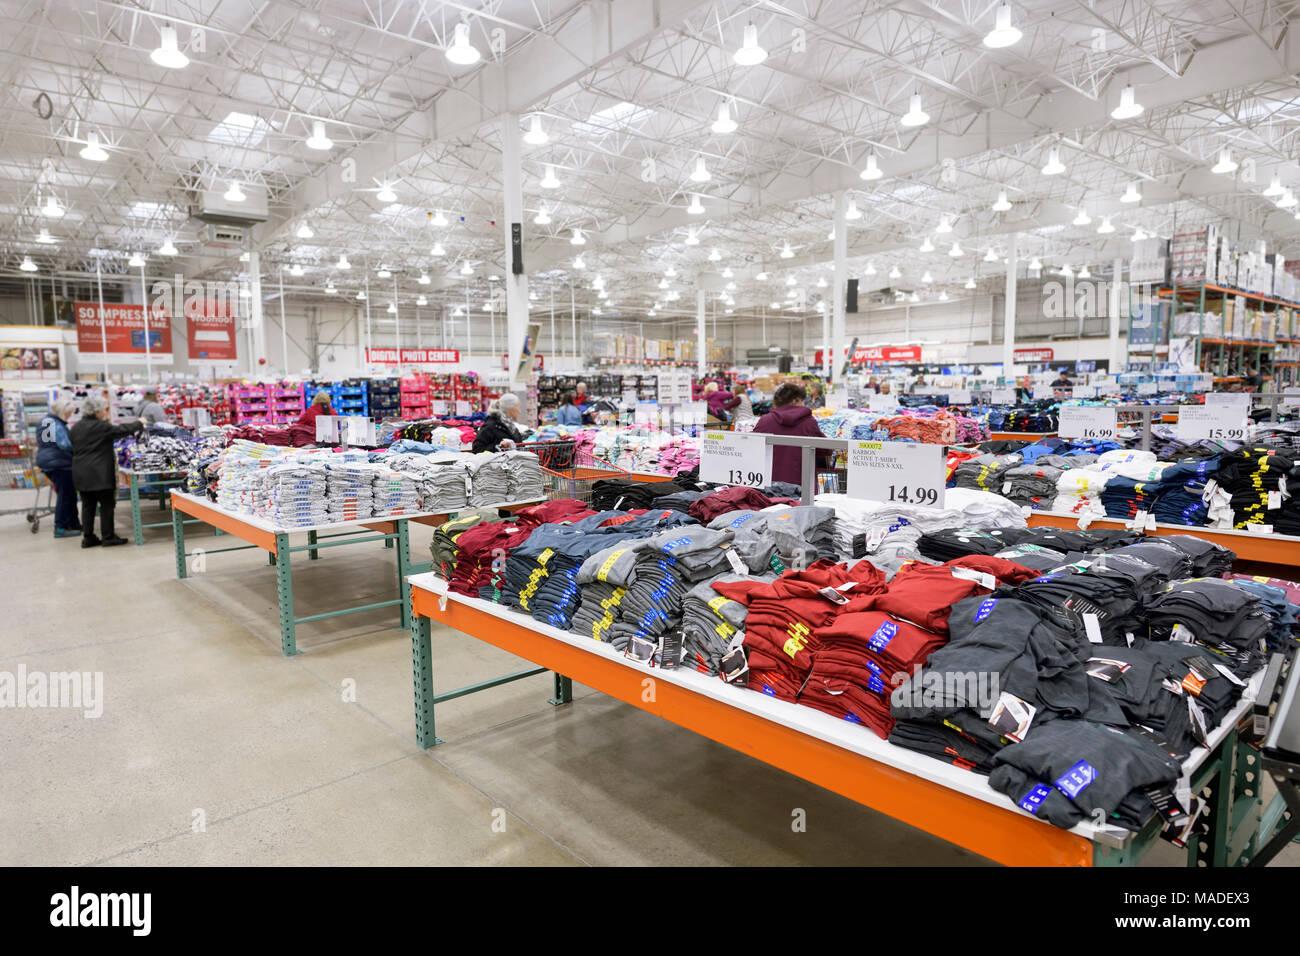 Costco Wholesale membership warehouse store interior, T-shirts at the mens clothing section. British Columbia, Canada 2017. - Stock Image